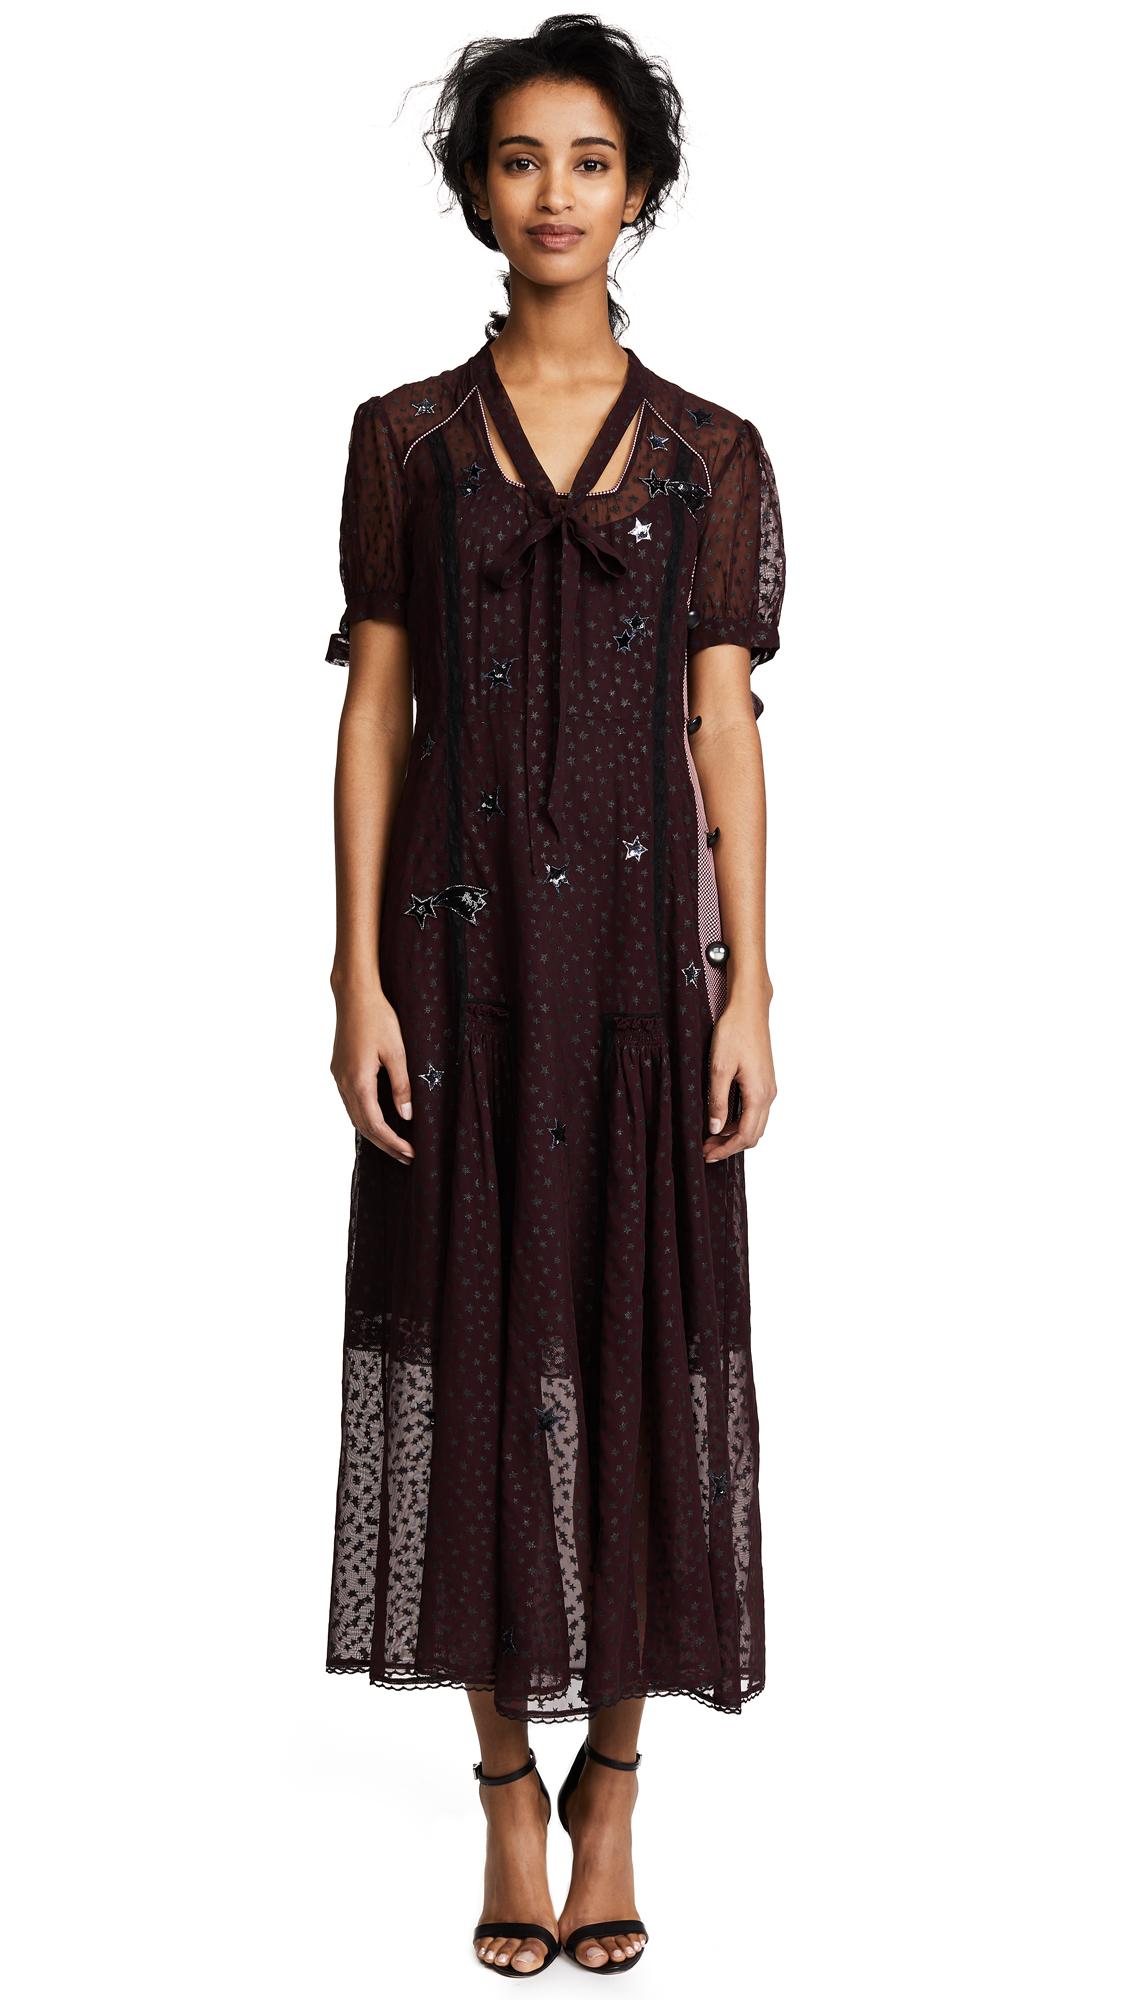 Coach 1941 Long Star Print Dress